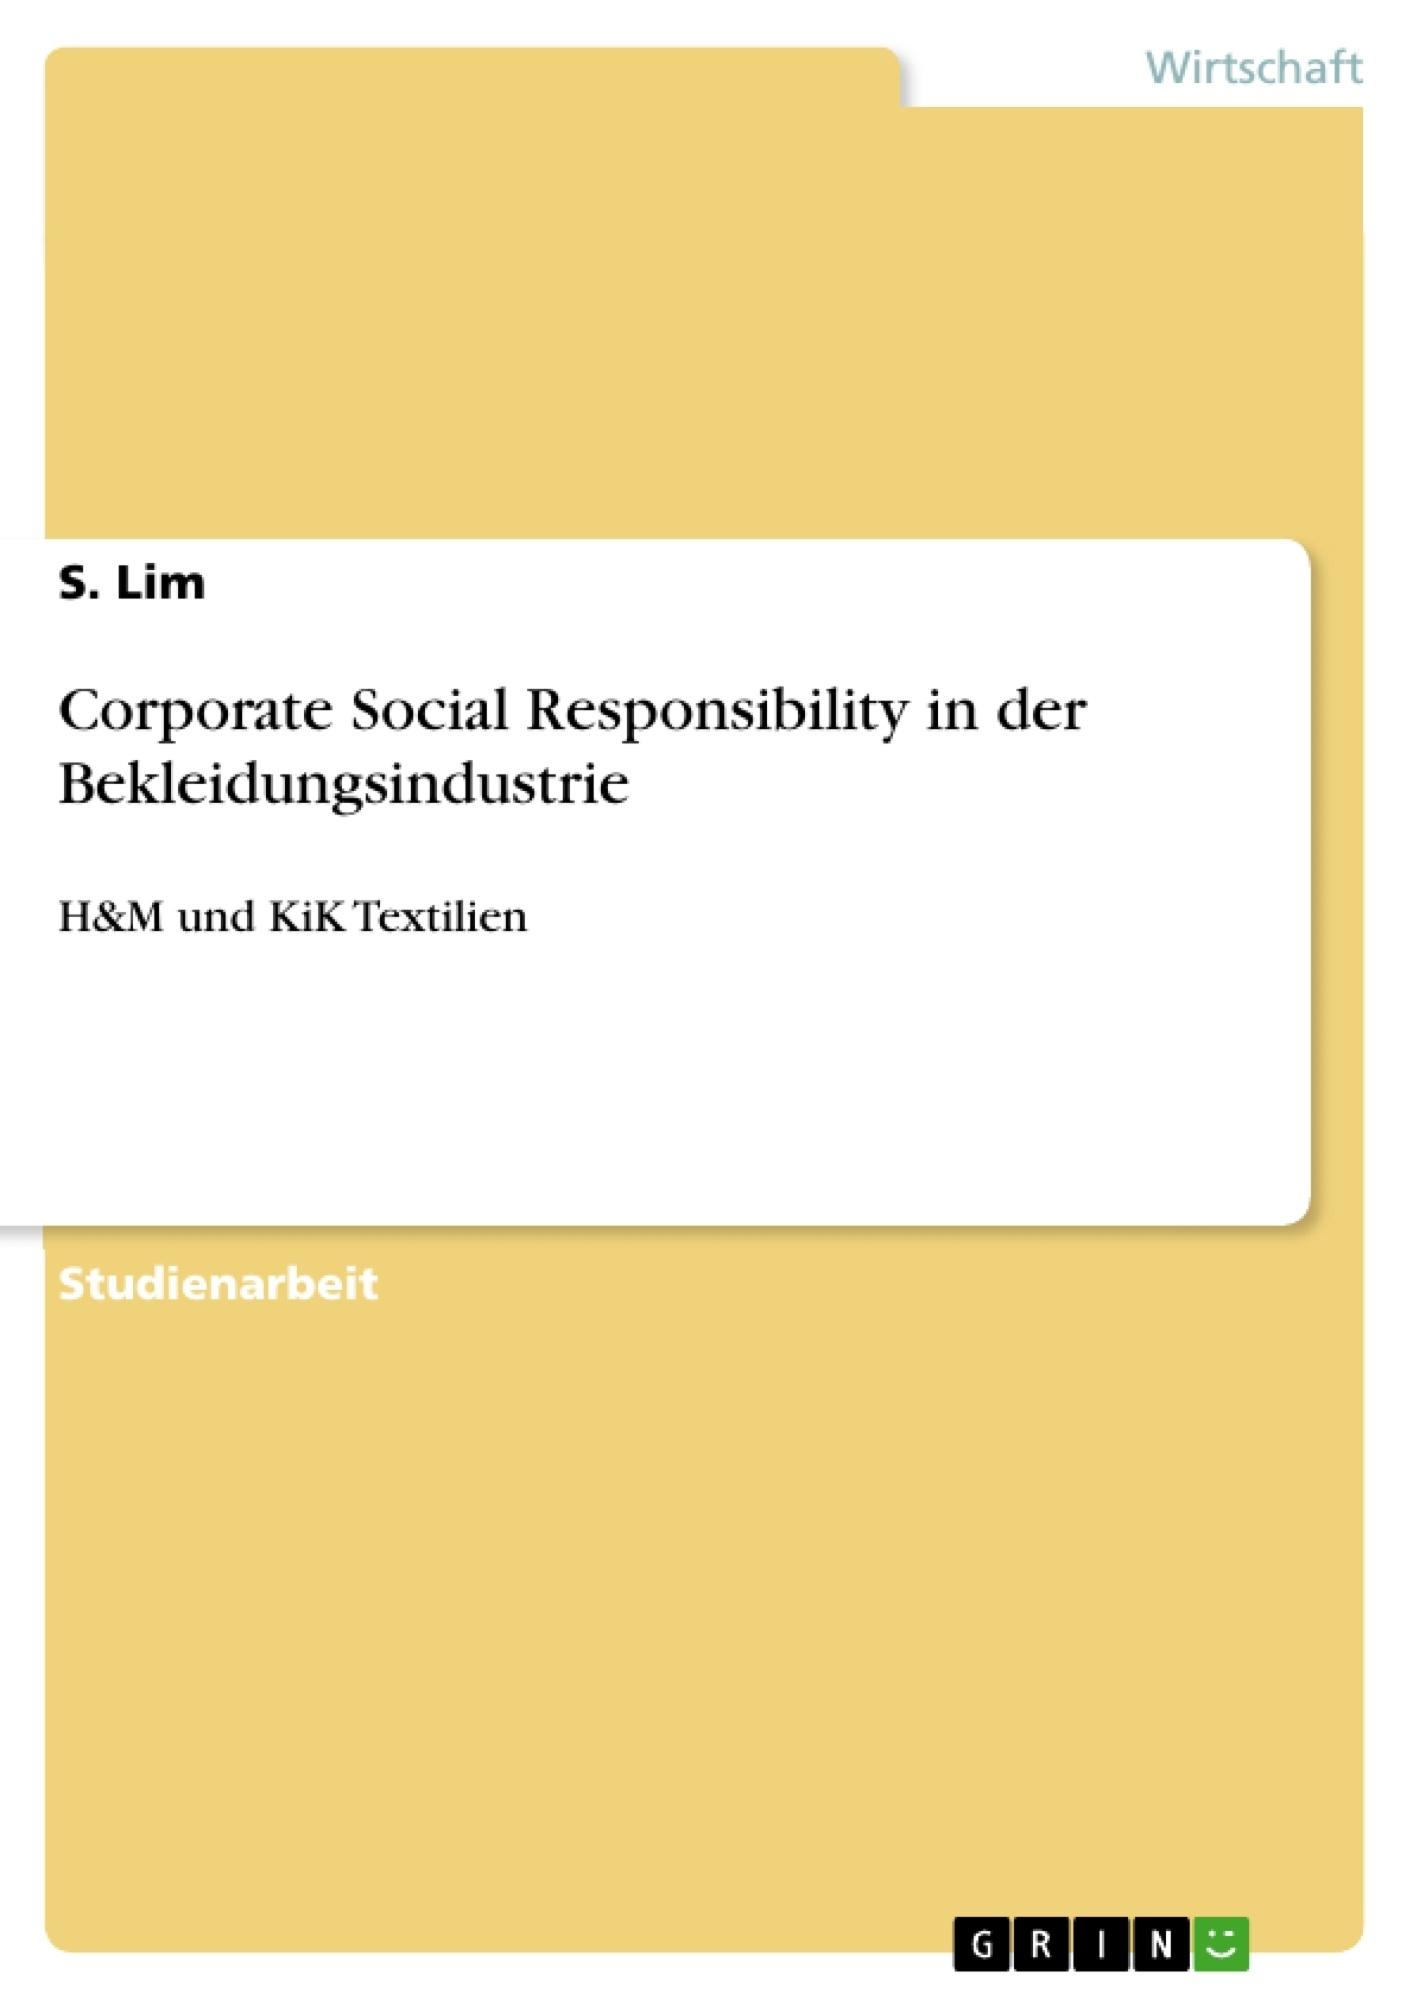 Titel: Corporate Social Responsibility in der Bekleidungsindustrie